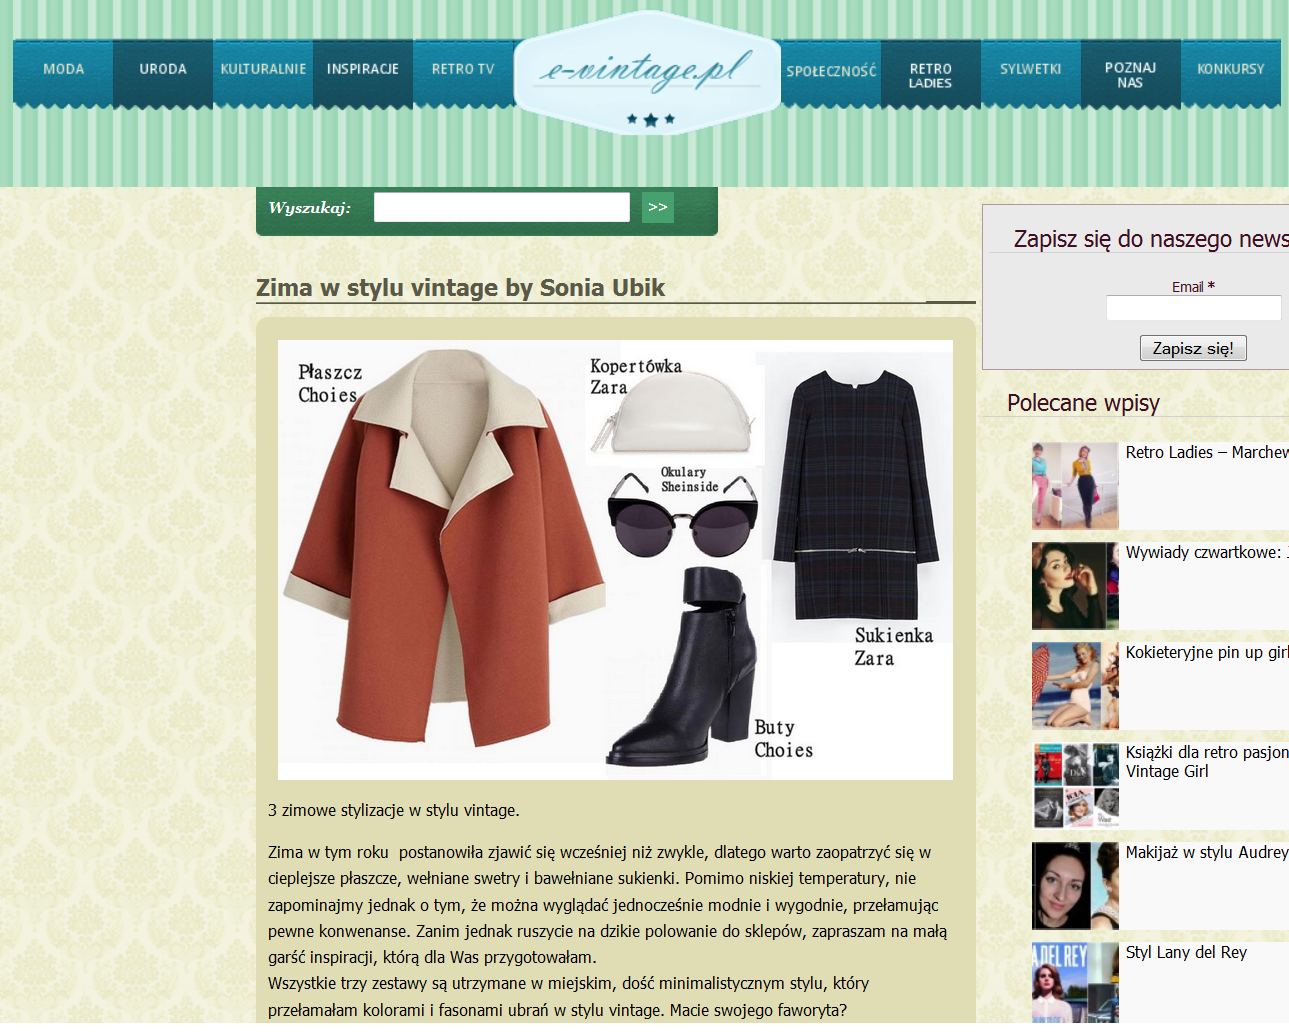 http://e-vintage.pl/zima-w-stylu-vintage-by-sonia-ubik/